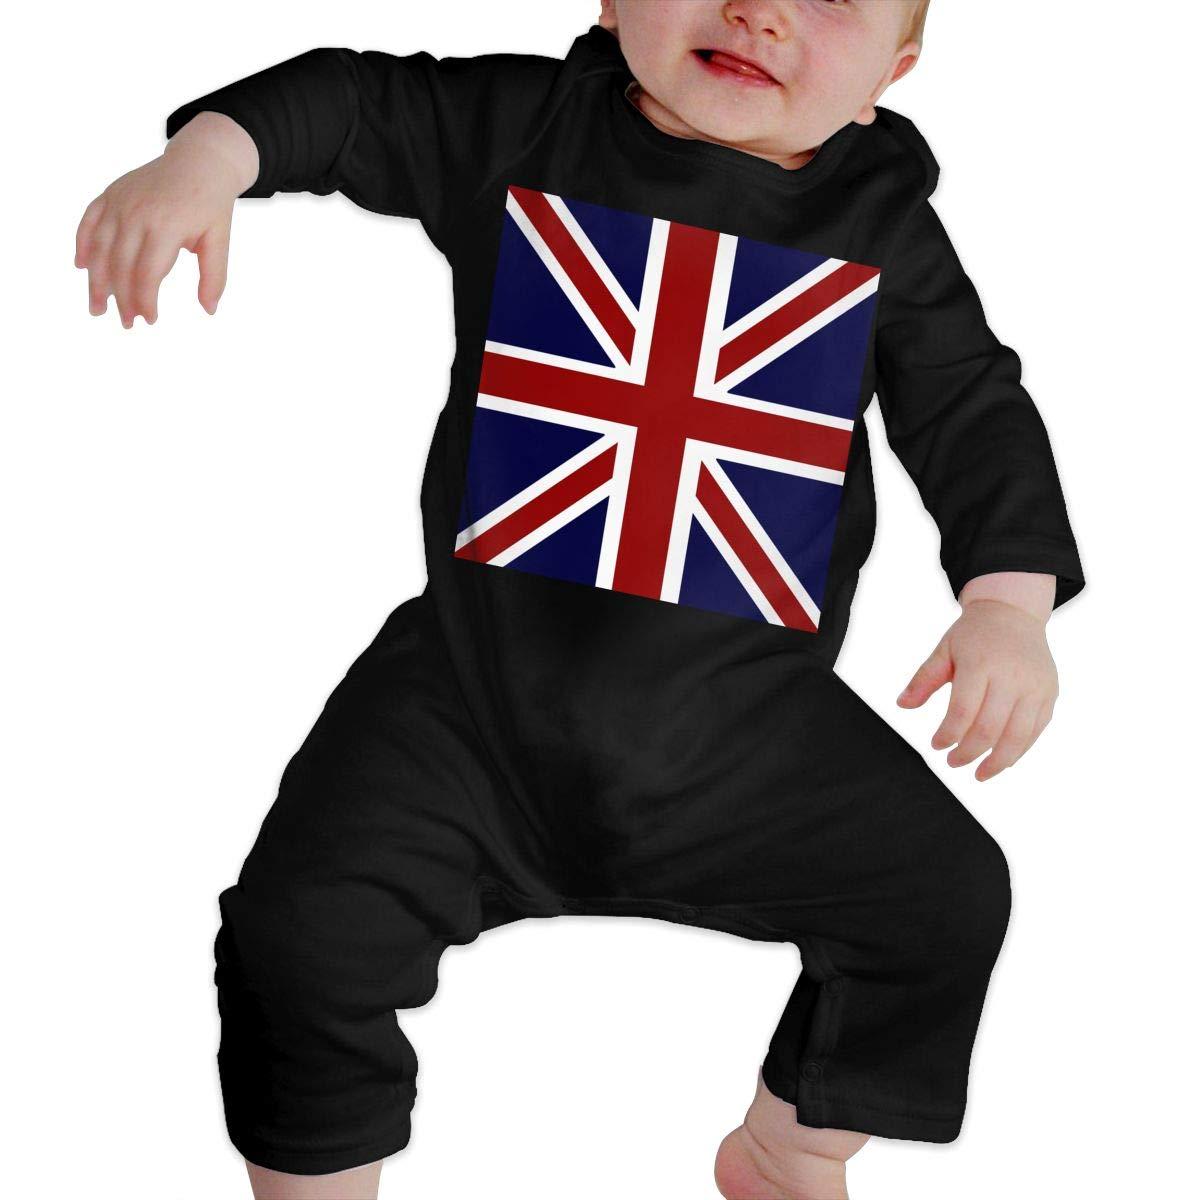 YUE--3BODY British Flag Toddler Baby Boy Girl Long Sleeve Infant Bodysuit